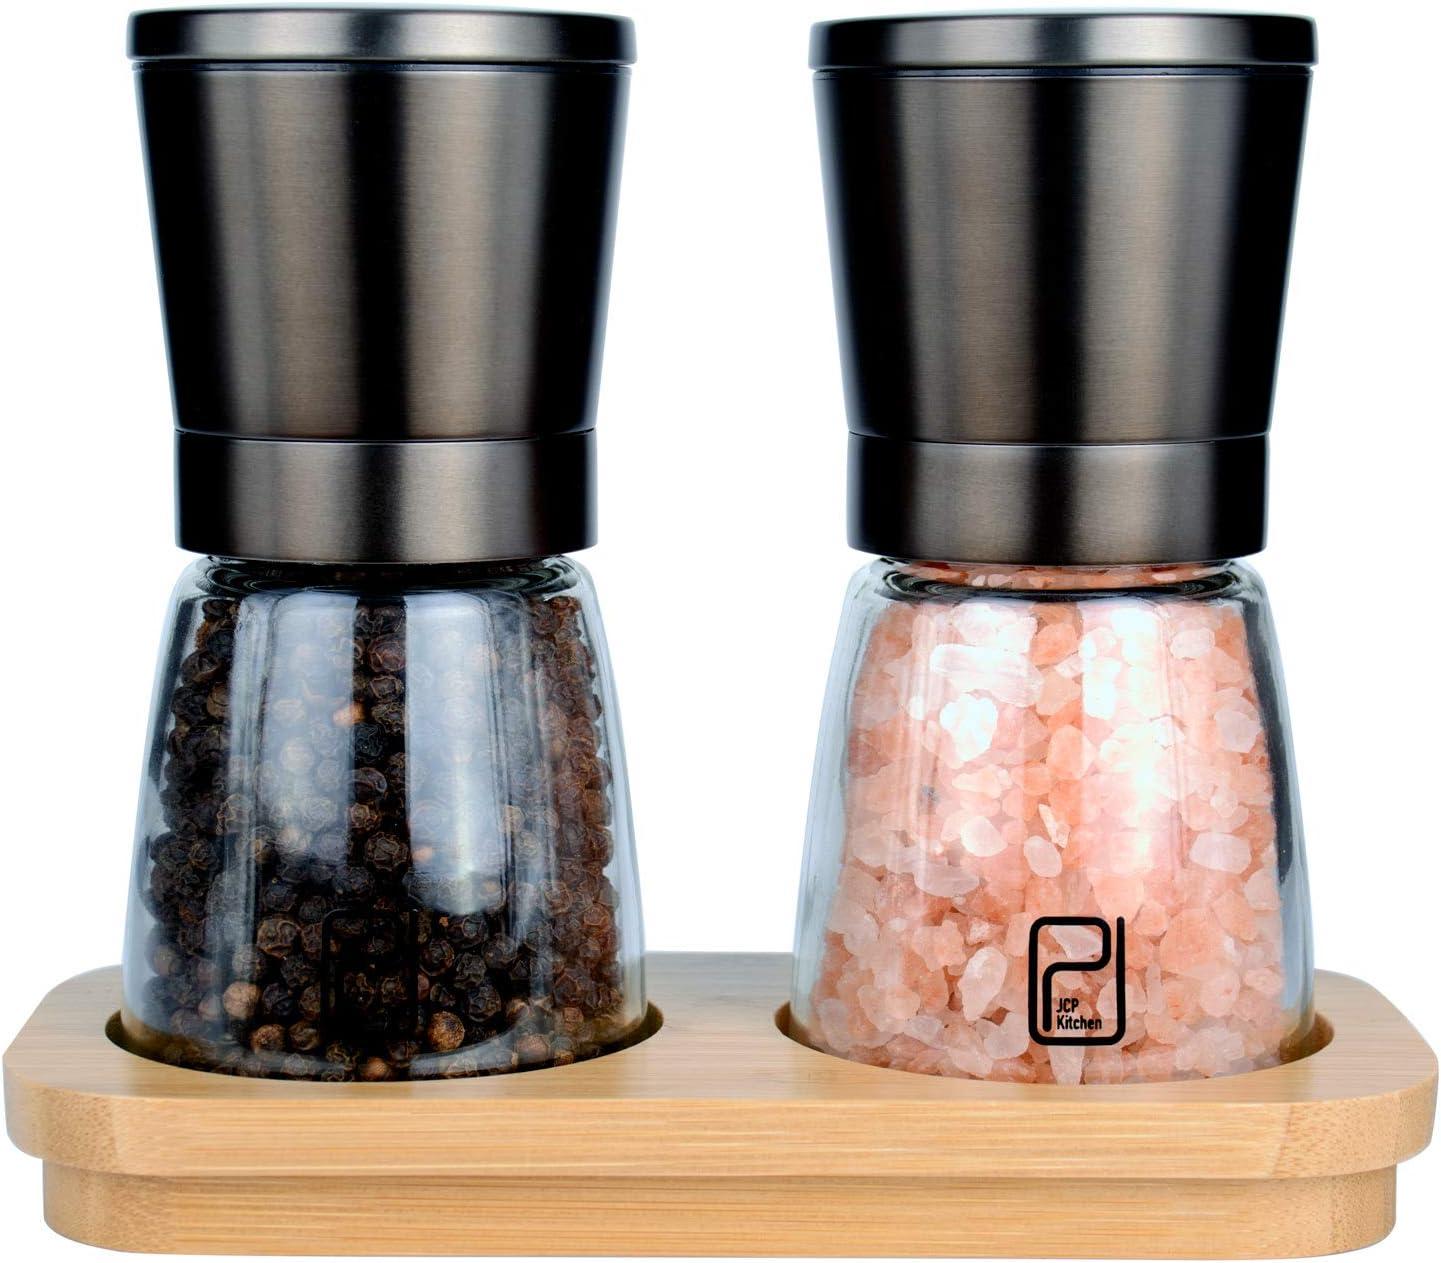 Premium Stainless Steel Salt and Pepper Shakers with Ceramic Spice Grinder Mill for Adjustable Coarseness I AM WAY Professional Salt and Pepper Grinder Set